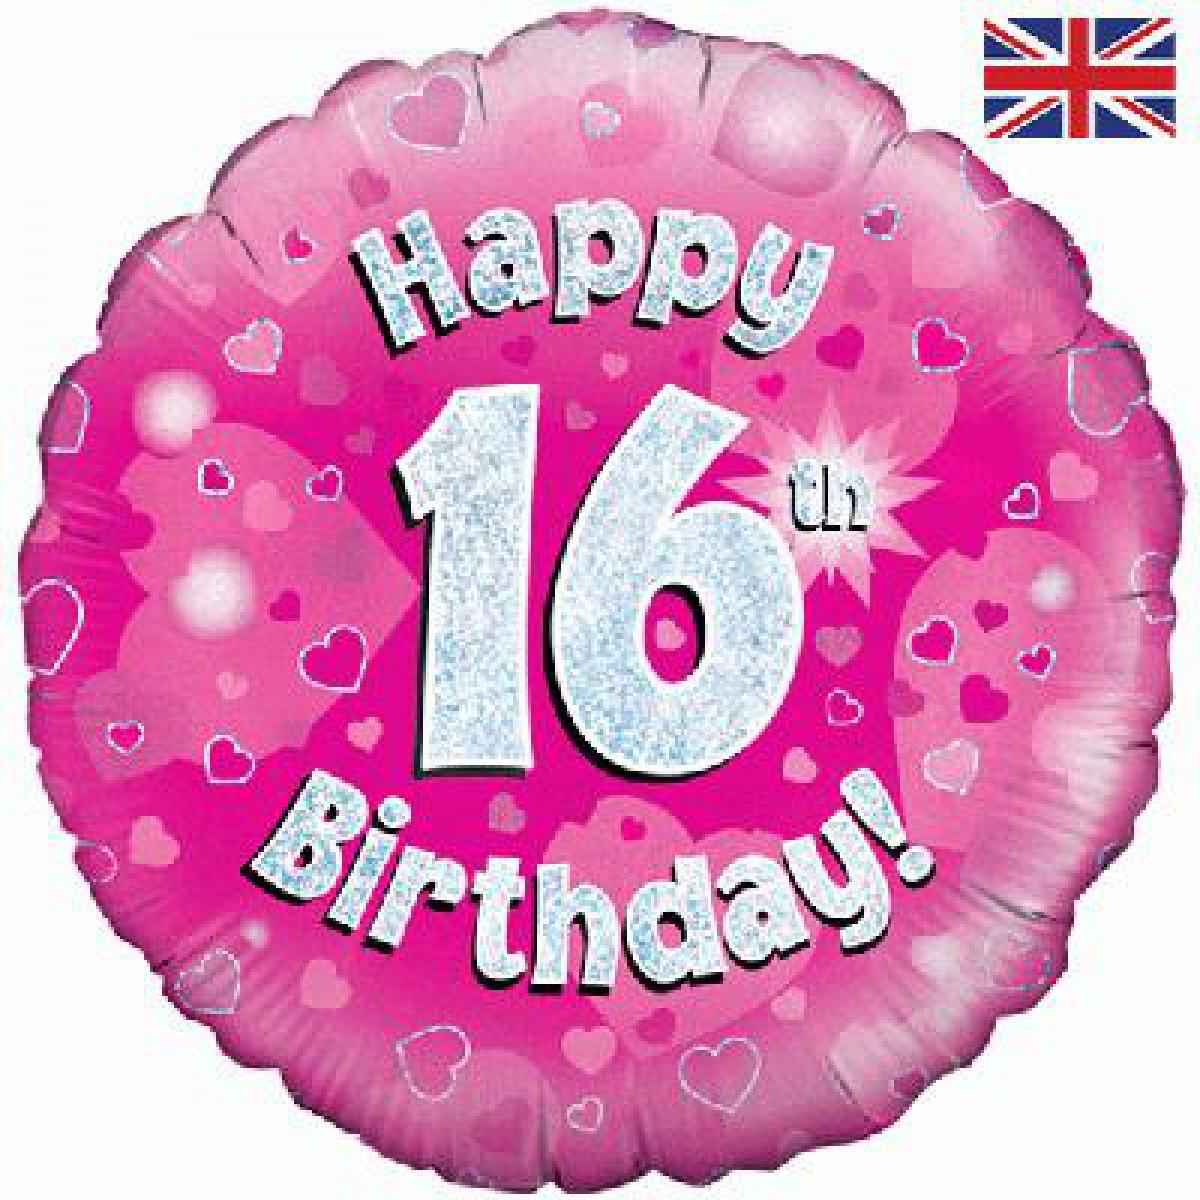 Happy Birthday 16 Quotes: Happy 16th Birthday Daughter Quotes. QuotesGram